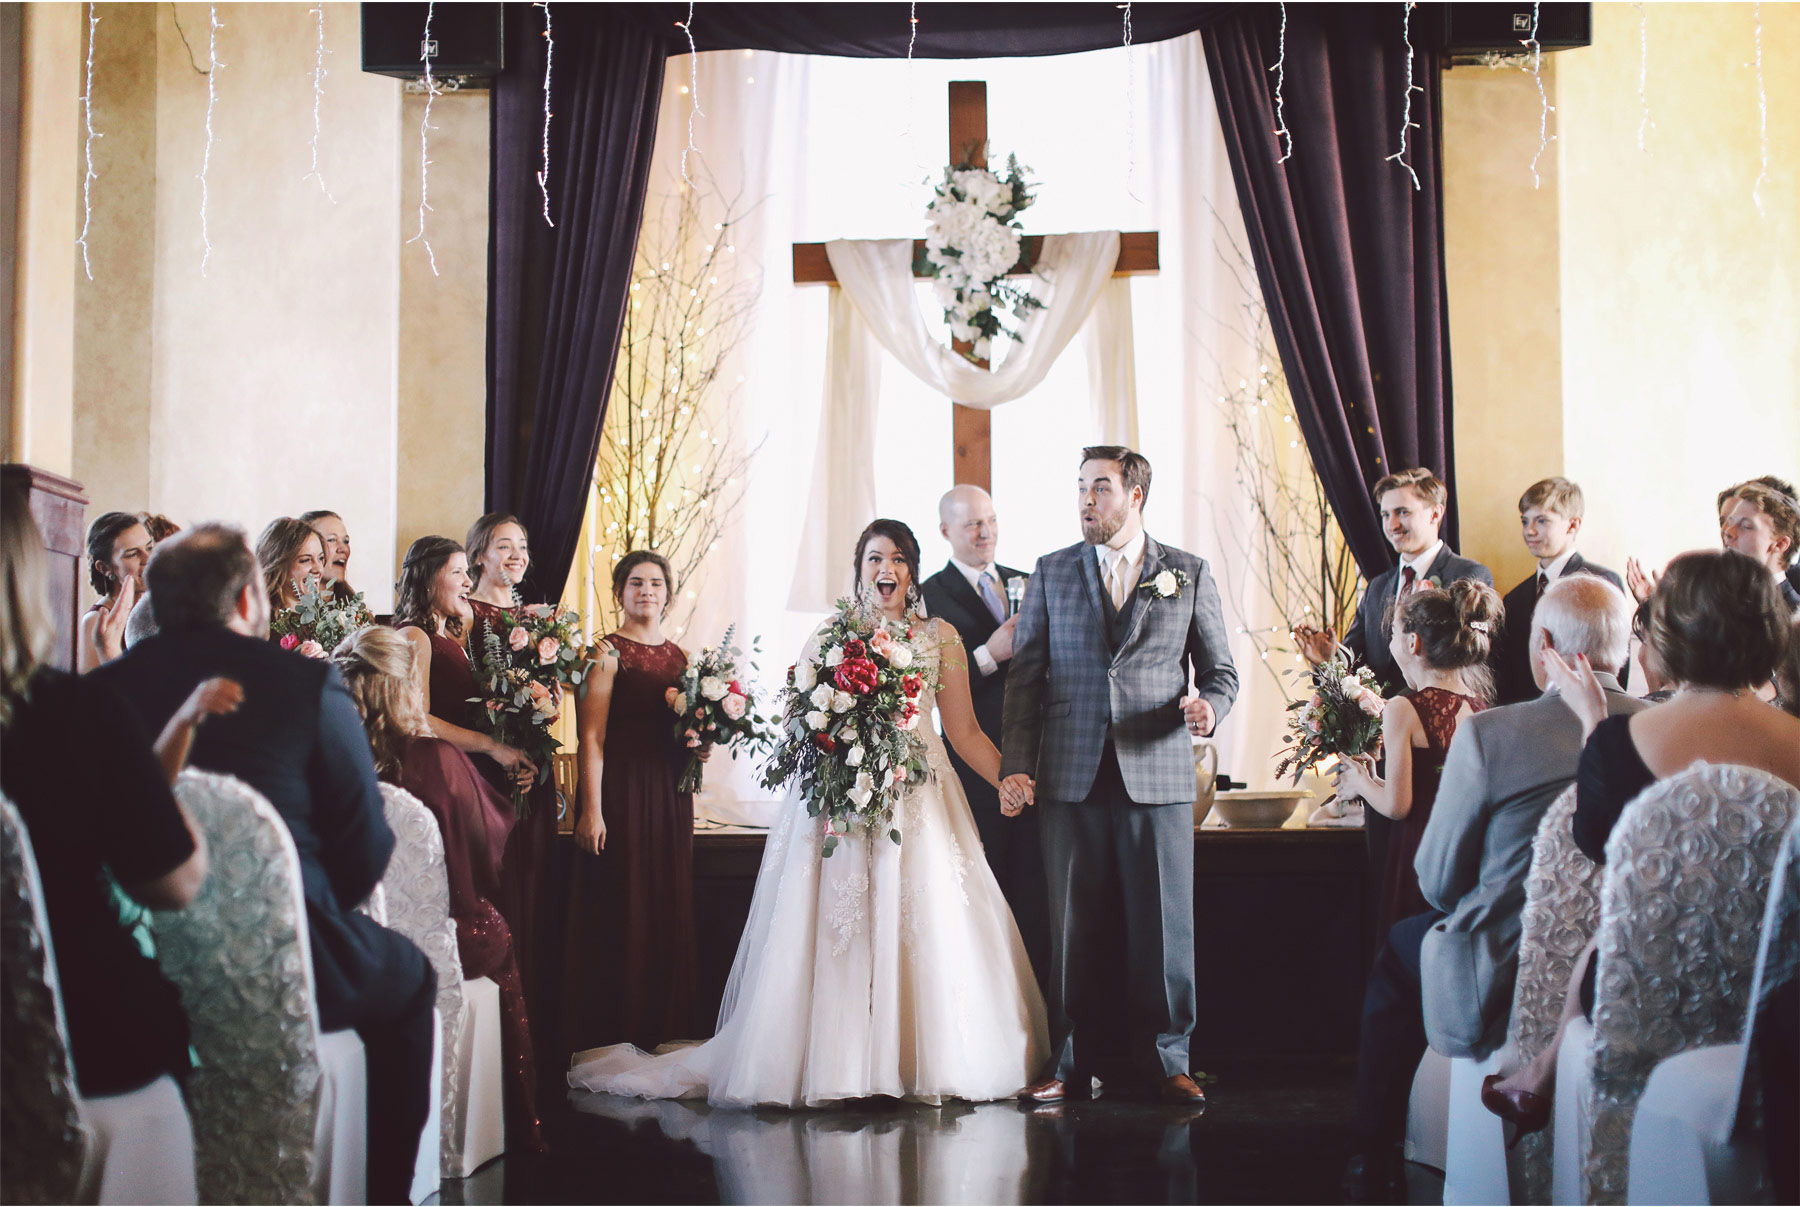 15-Minneapolis-Wedding-Photography-by-Vick-Photography-Historic-Concord-Exchange-Ceremony-Rachael-and-Benjamin.jpg